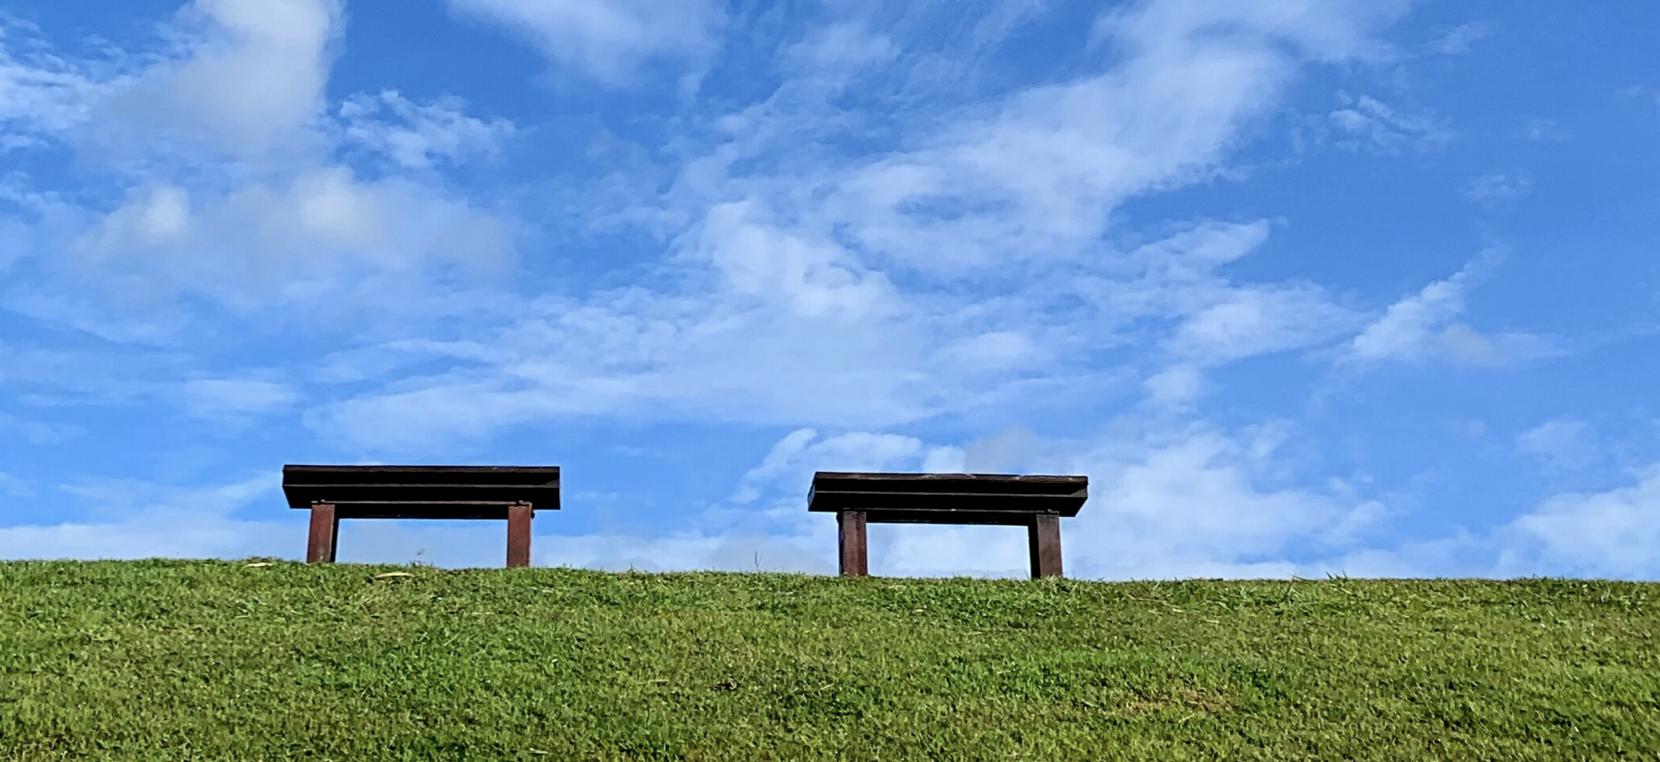 Atempause – Tagzeitengebete